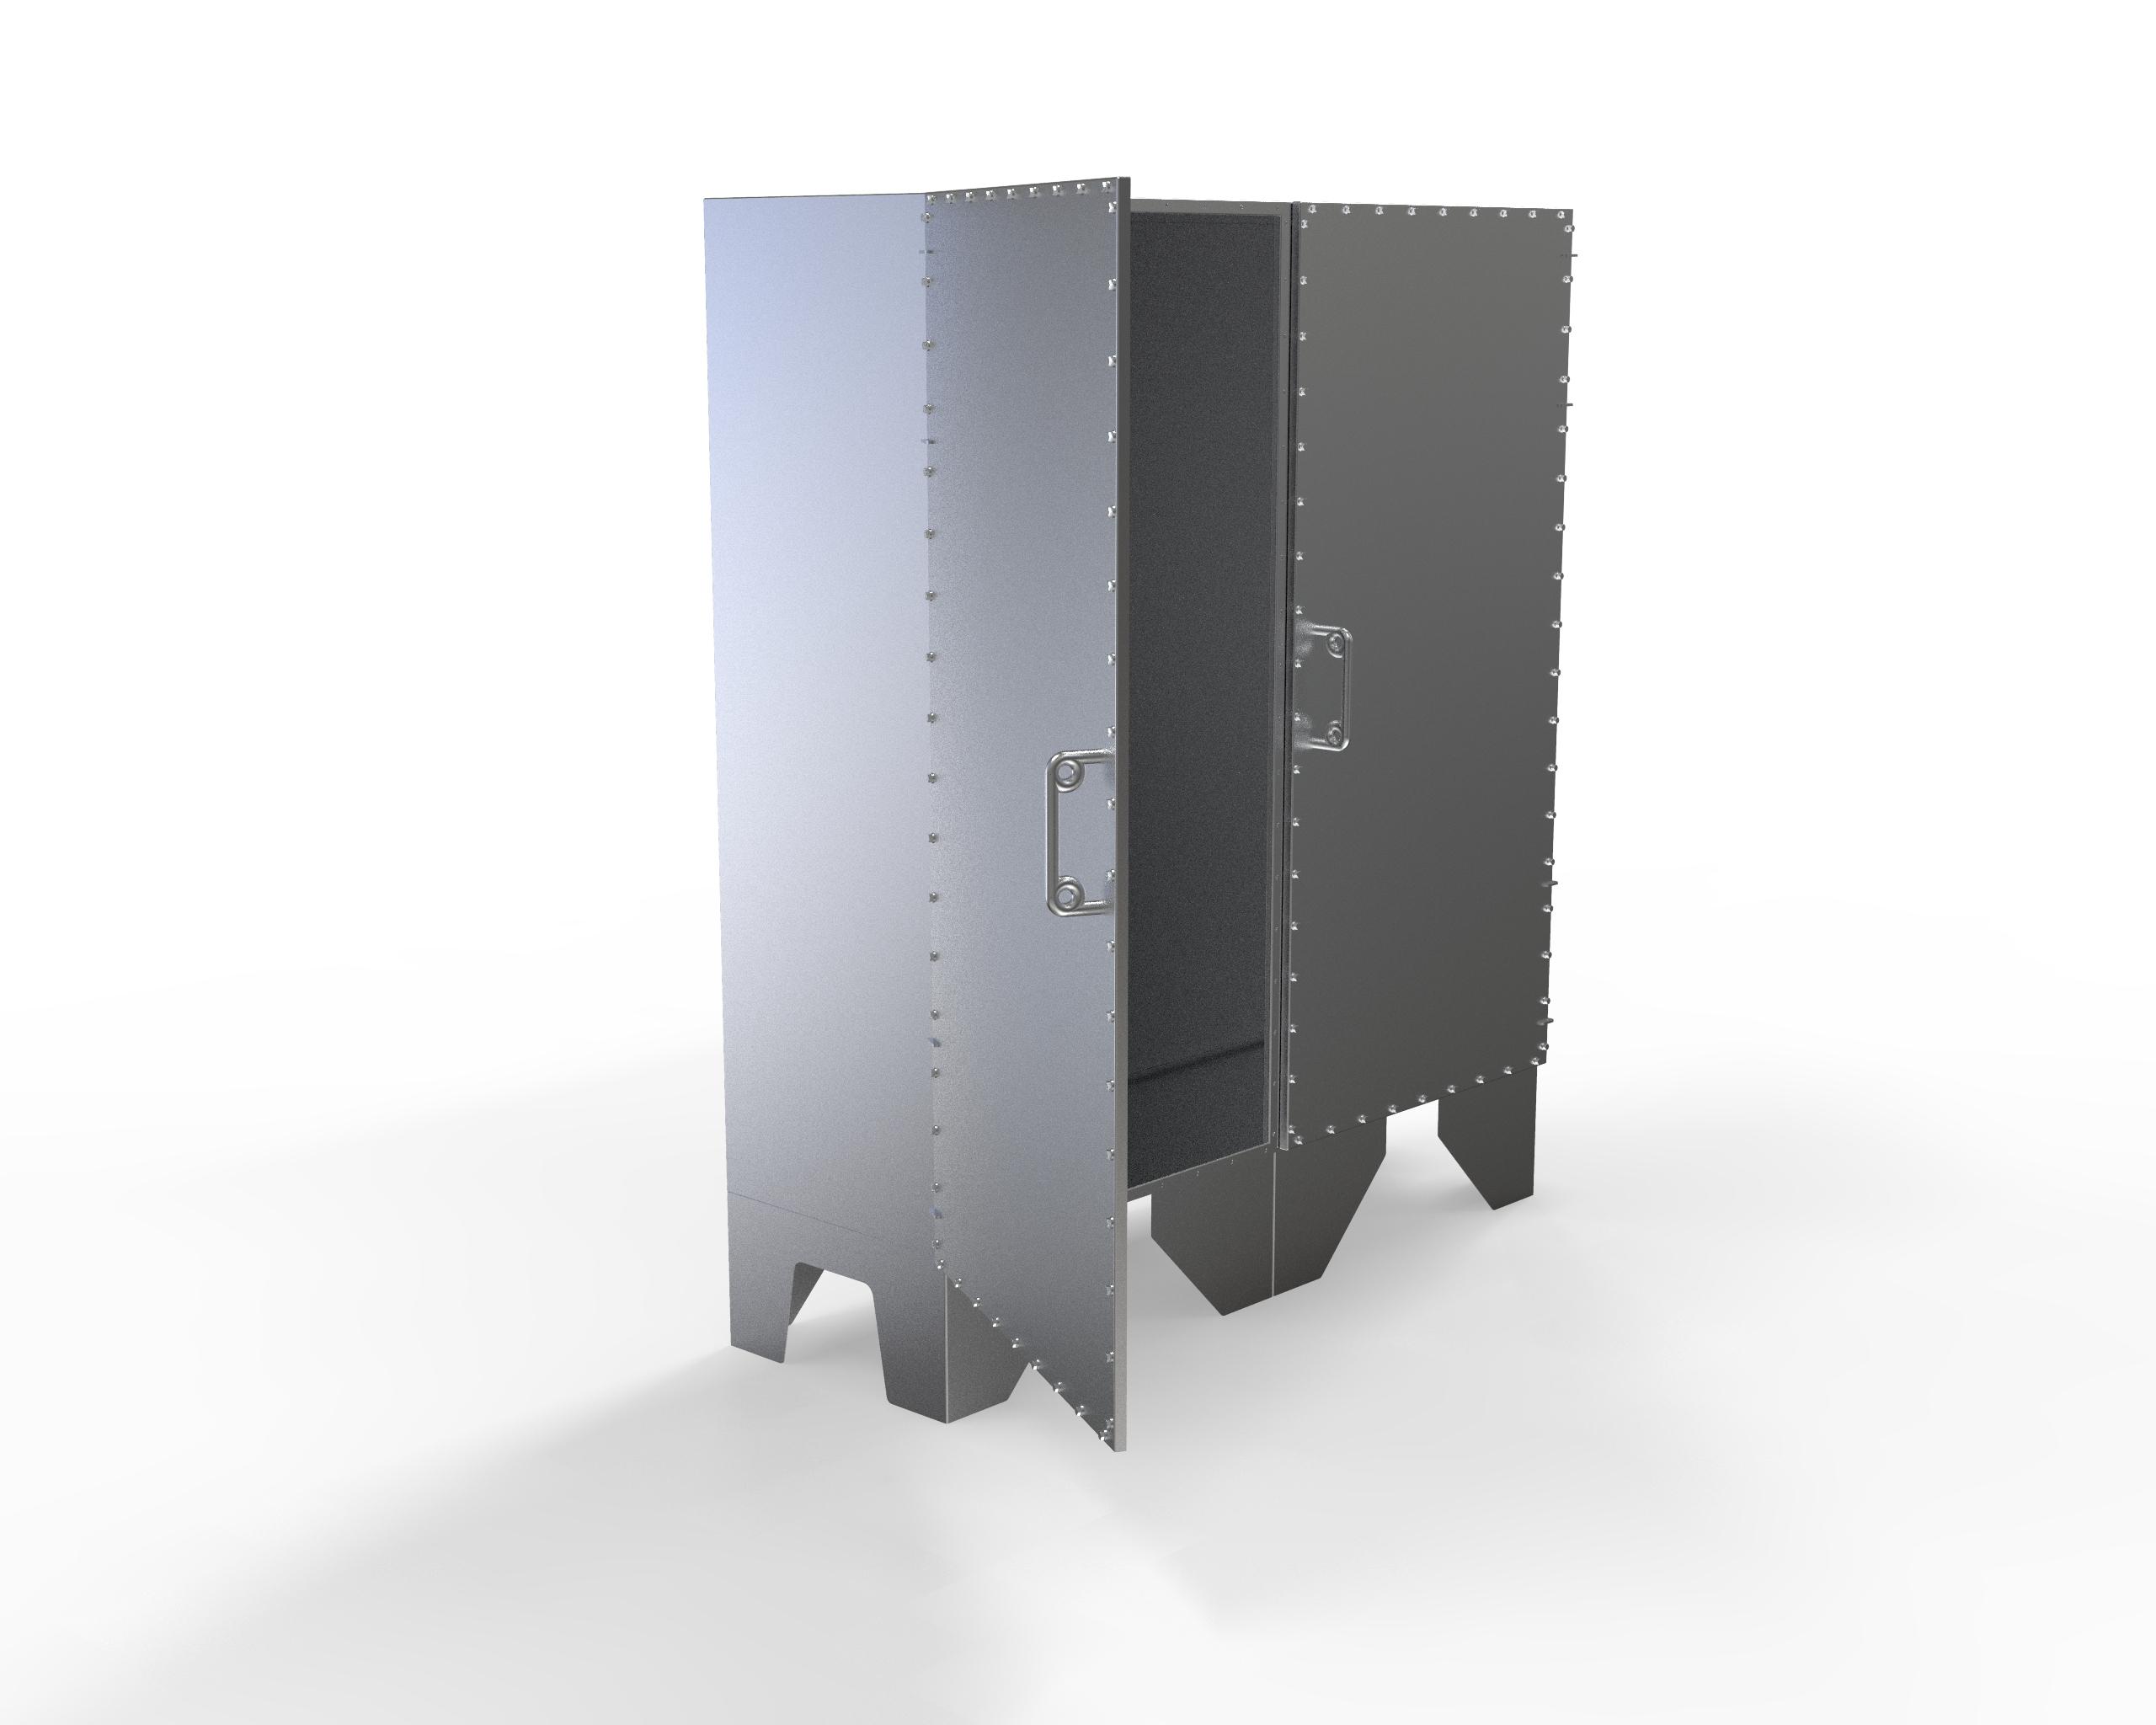 NEMA 6P enclosure 316 stainless steel, IP68, junction box, submersible enclosure, watertight, dust proof, electrical panel, IP68 Panel, NEMA Panel, NEMA 6P enclosure 316 stainless steel, IP68, SUBSEA, 30ft submersion, submersible enclosure, electrical enclosure, deep sea enclosures, rugged enclosure, waterproof enclosure, NEMA enclosure, stainless steel enclosure, stainless steel junction box, NEMA junction box, Waterproof electrical housing, NEMA 6P Housing, Pressure Vessel, SubSea Housing, SubSea Enclosure, Polyurethane Enclosure, Polyurethane Housing, Aluminum Enclosure, Aluminum NEMA 6P, Aluminum IP68, Deep Sea Enclosures, Offshore Enclosure, Storm Protection, Impact resistant Enclosure, MIL-STD-810, MIL-STD-285, EMC Enclosure, EMI enclosure, RFI enclosure, EMC shielding, EMI/RFI Enclosure, Enclosure Shock and Vibration, Defence Enclosure, Defense Enclosure, Defense Panel, Submersible Panel, Defense housing, underwater housing, underwater pressure vessel, SLAYSON